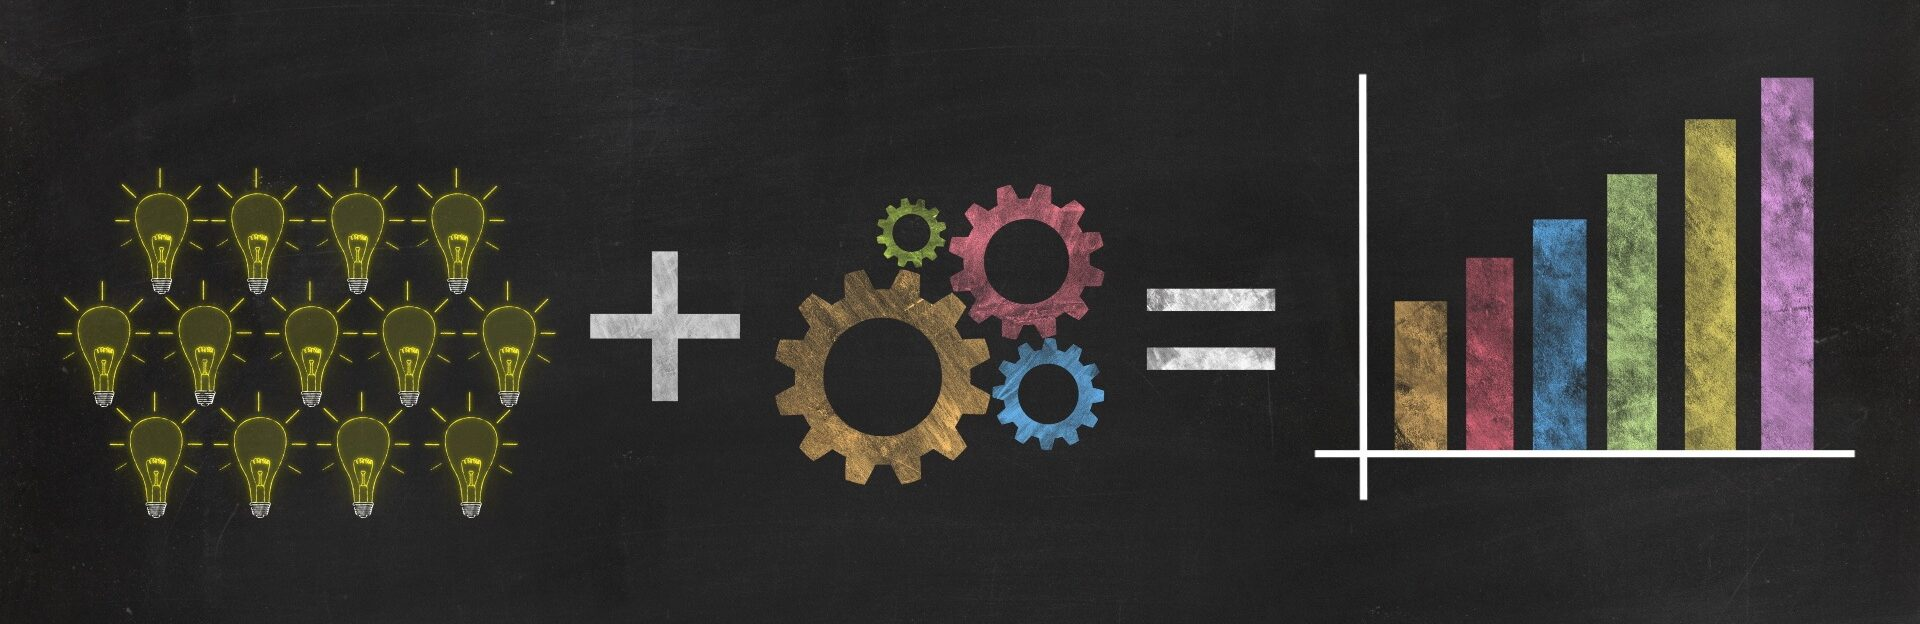 Produktionsberatung KVP | Standfest Unternehmensberatung